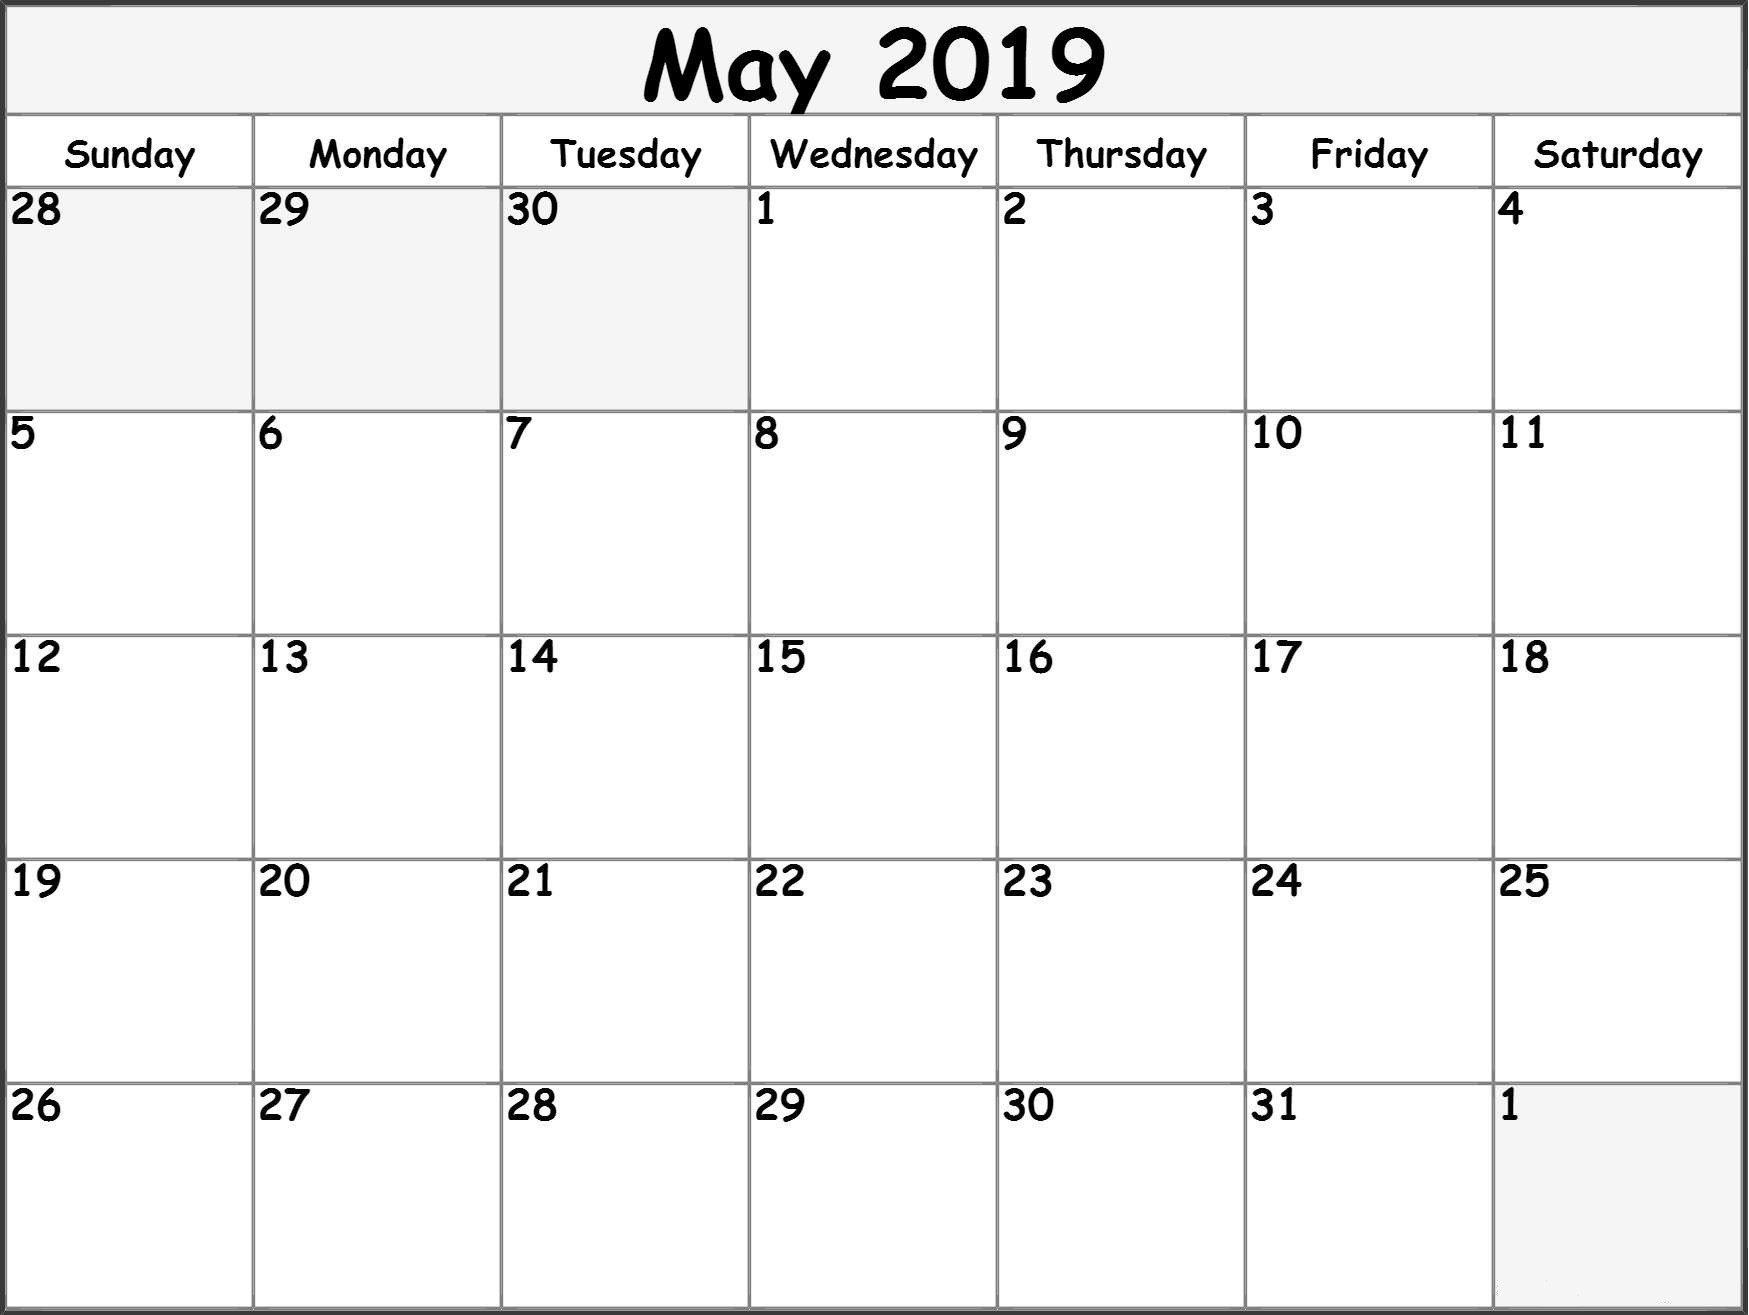 007 May Calendar Printable Template Ideas Free Shocking Blank March with Calendar Printable Free Template